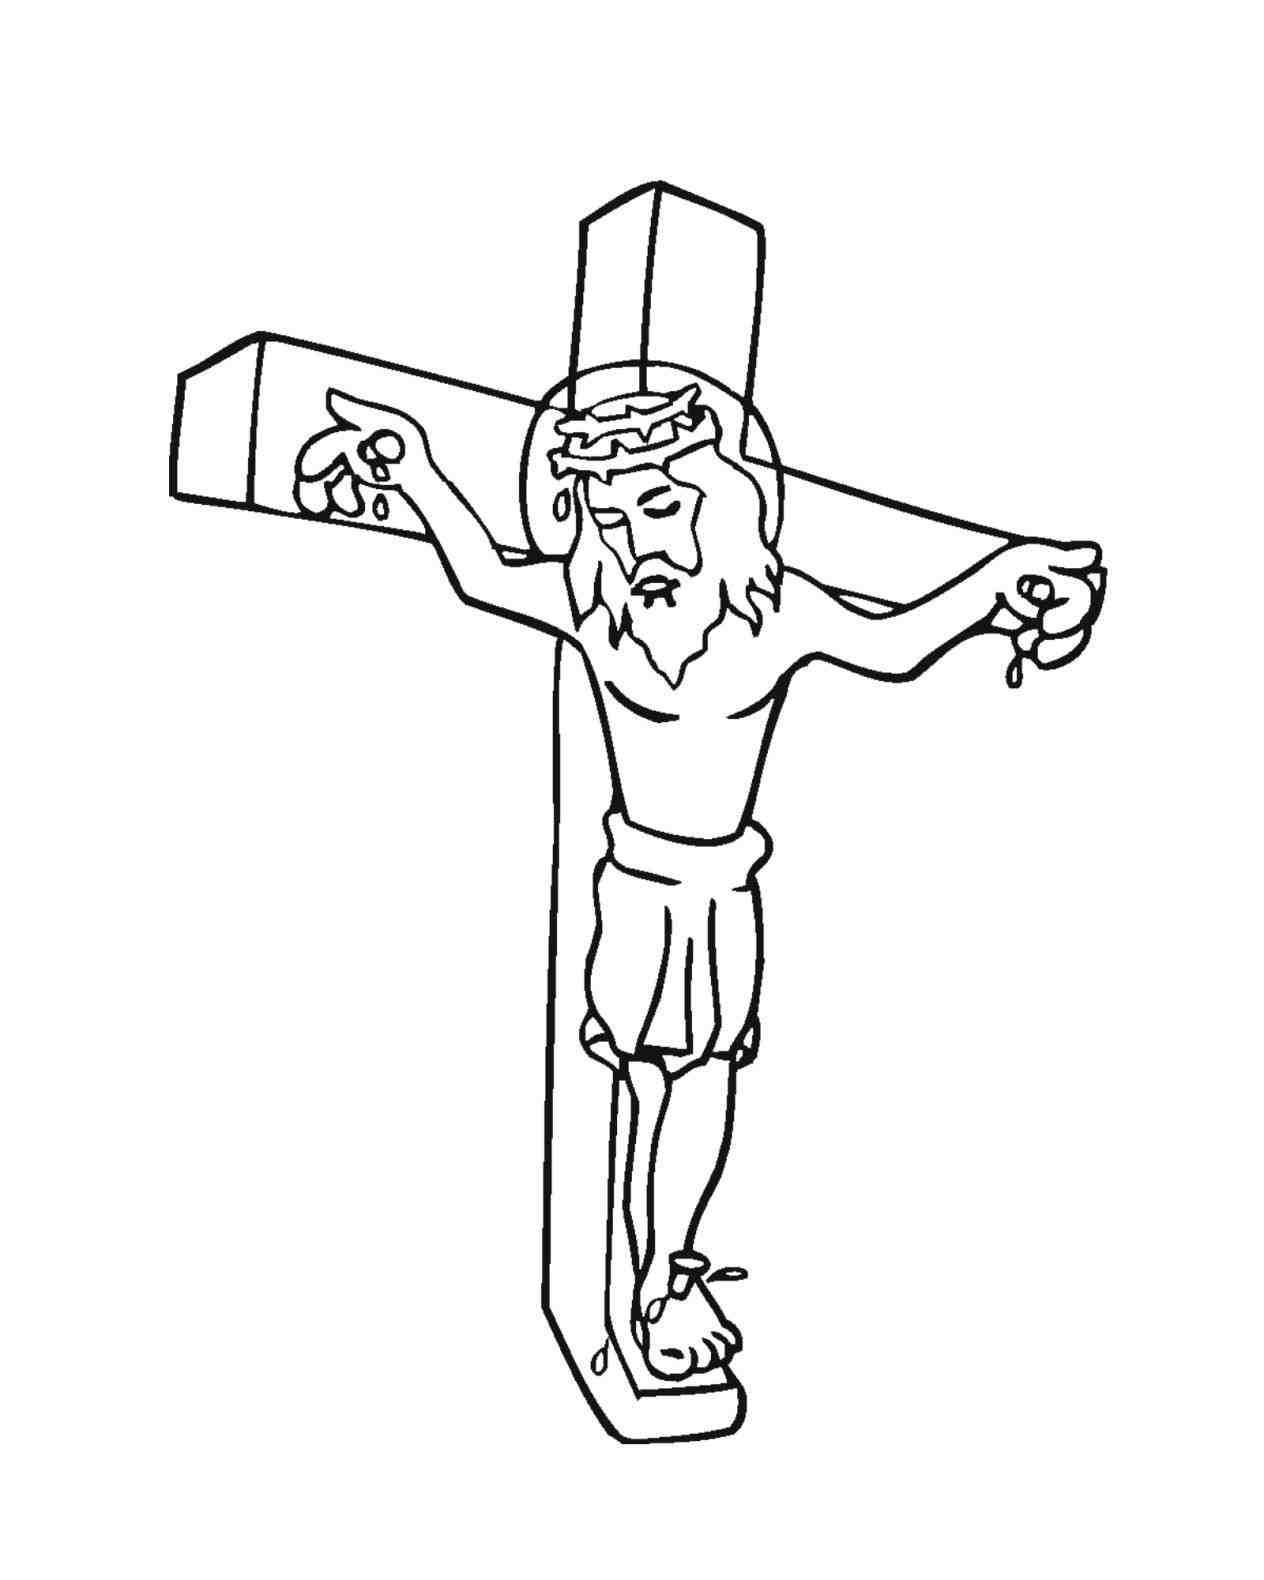 1264x1580 Drawings Of Jesus On The Cross